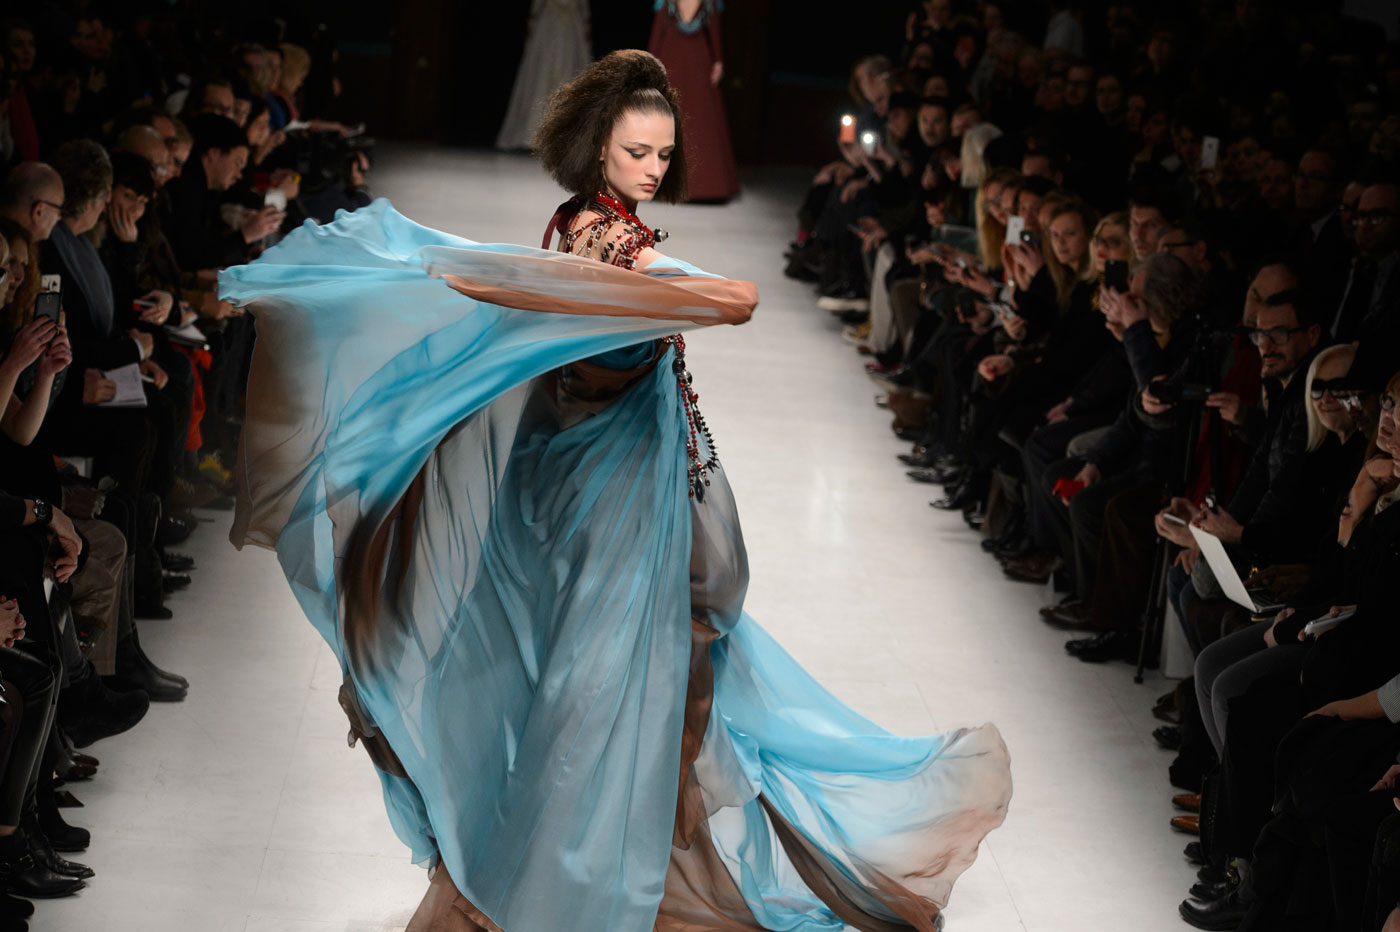 Julien-Fournie-Prive-fashion-runway-show-haute-couture-paris-spring-2015-the-impression-54